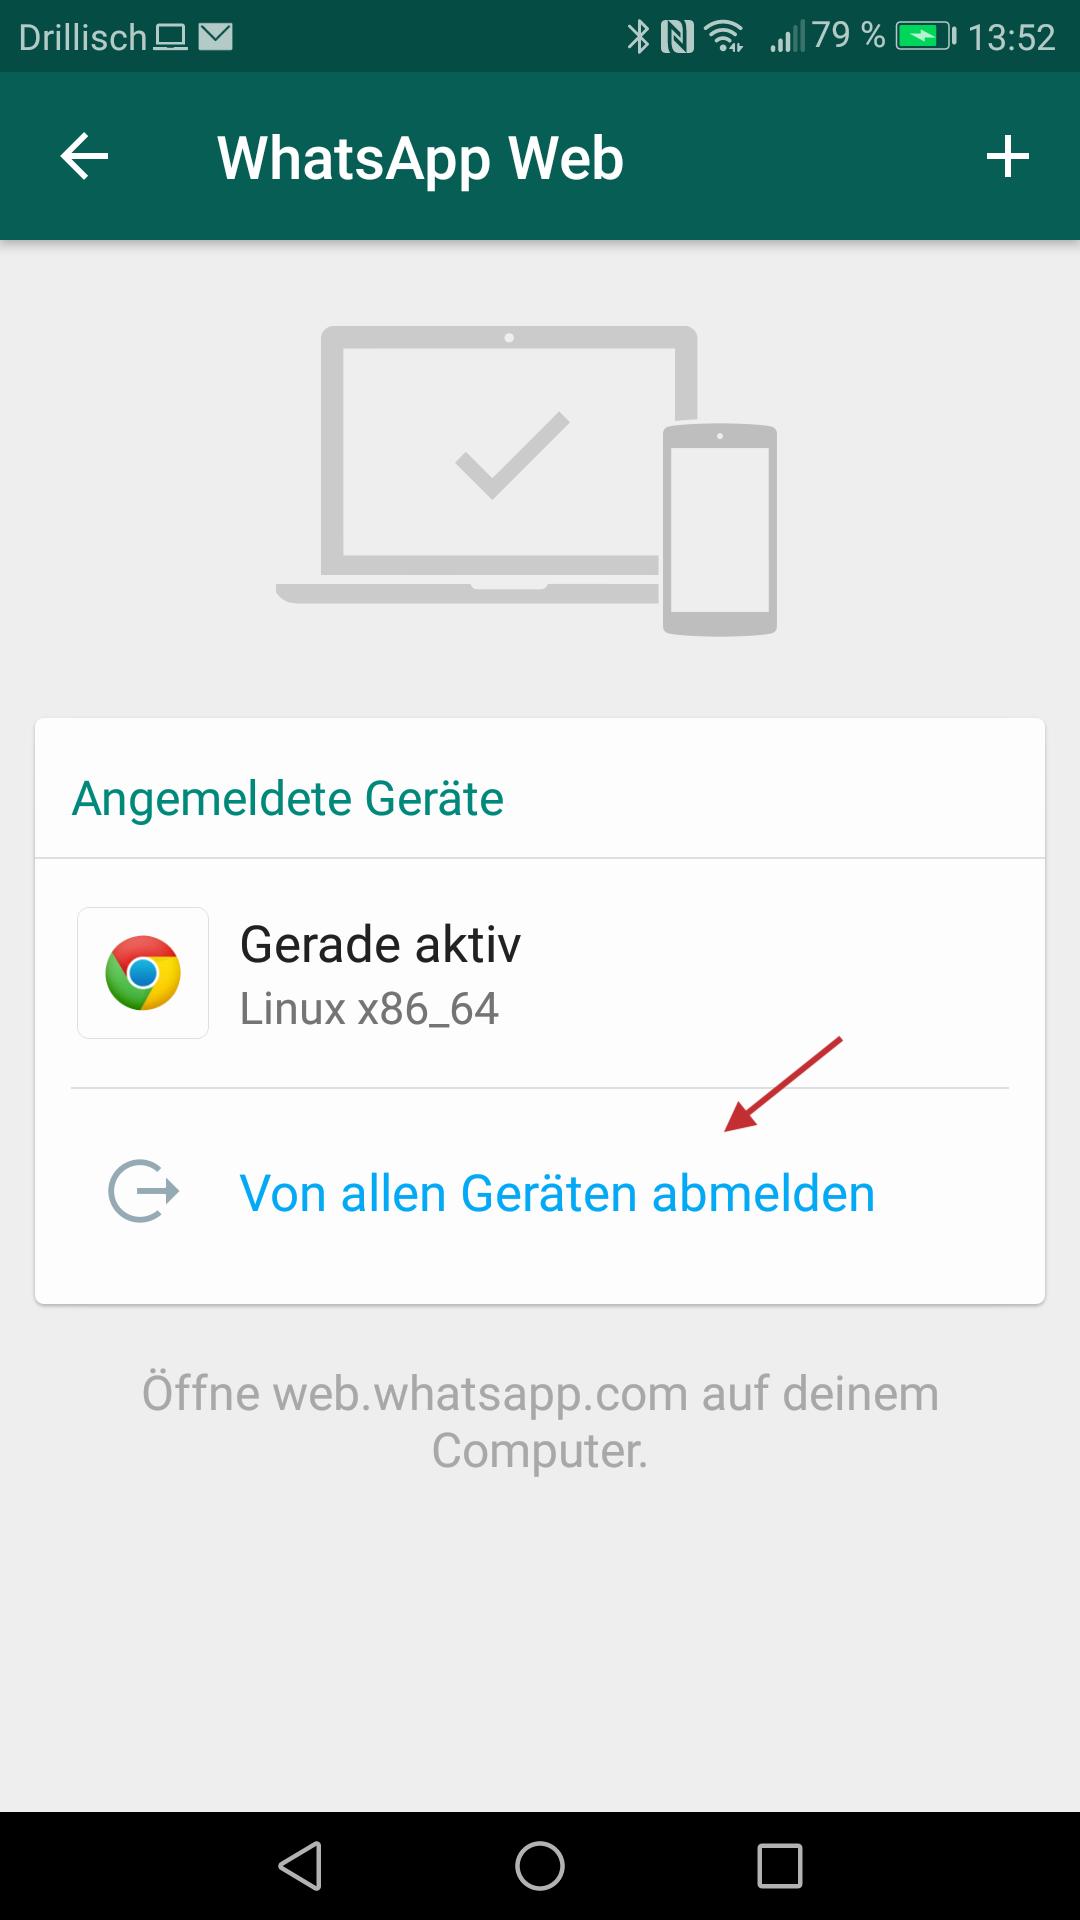 Abb 24 - WhatsApp Web QR Code scannen